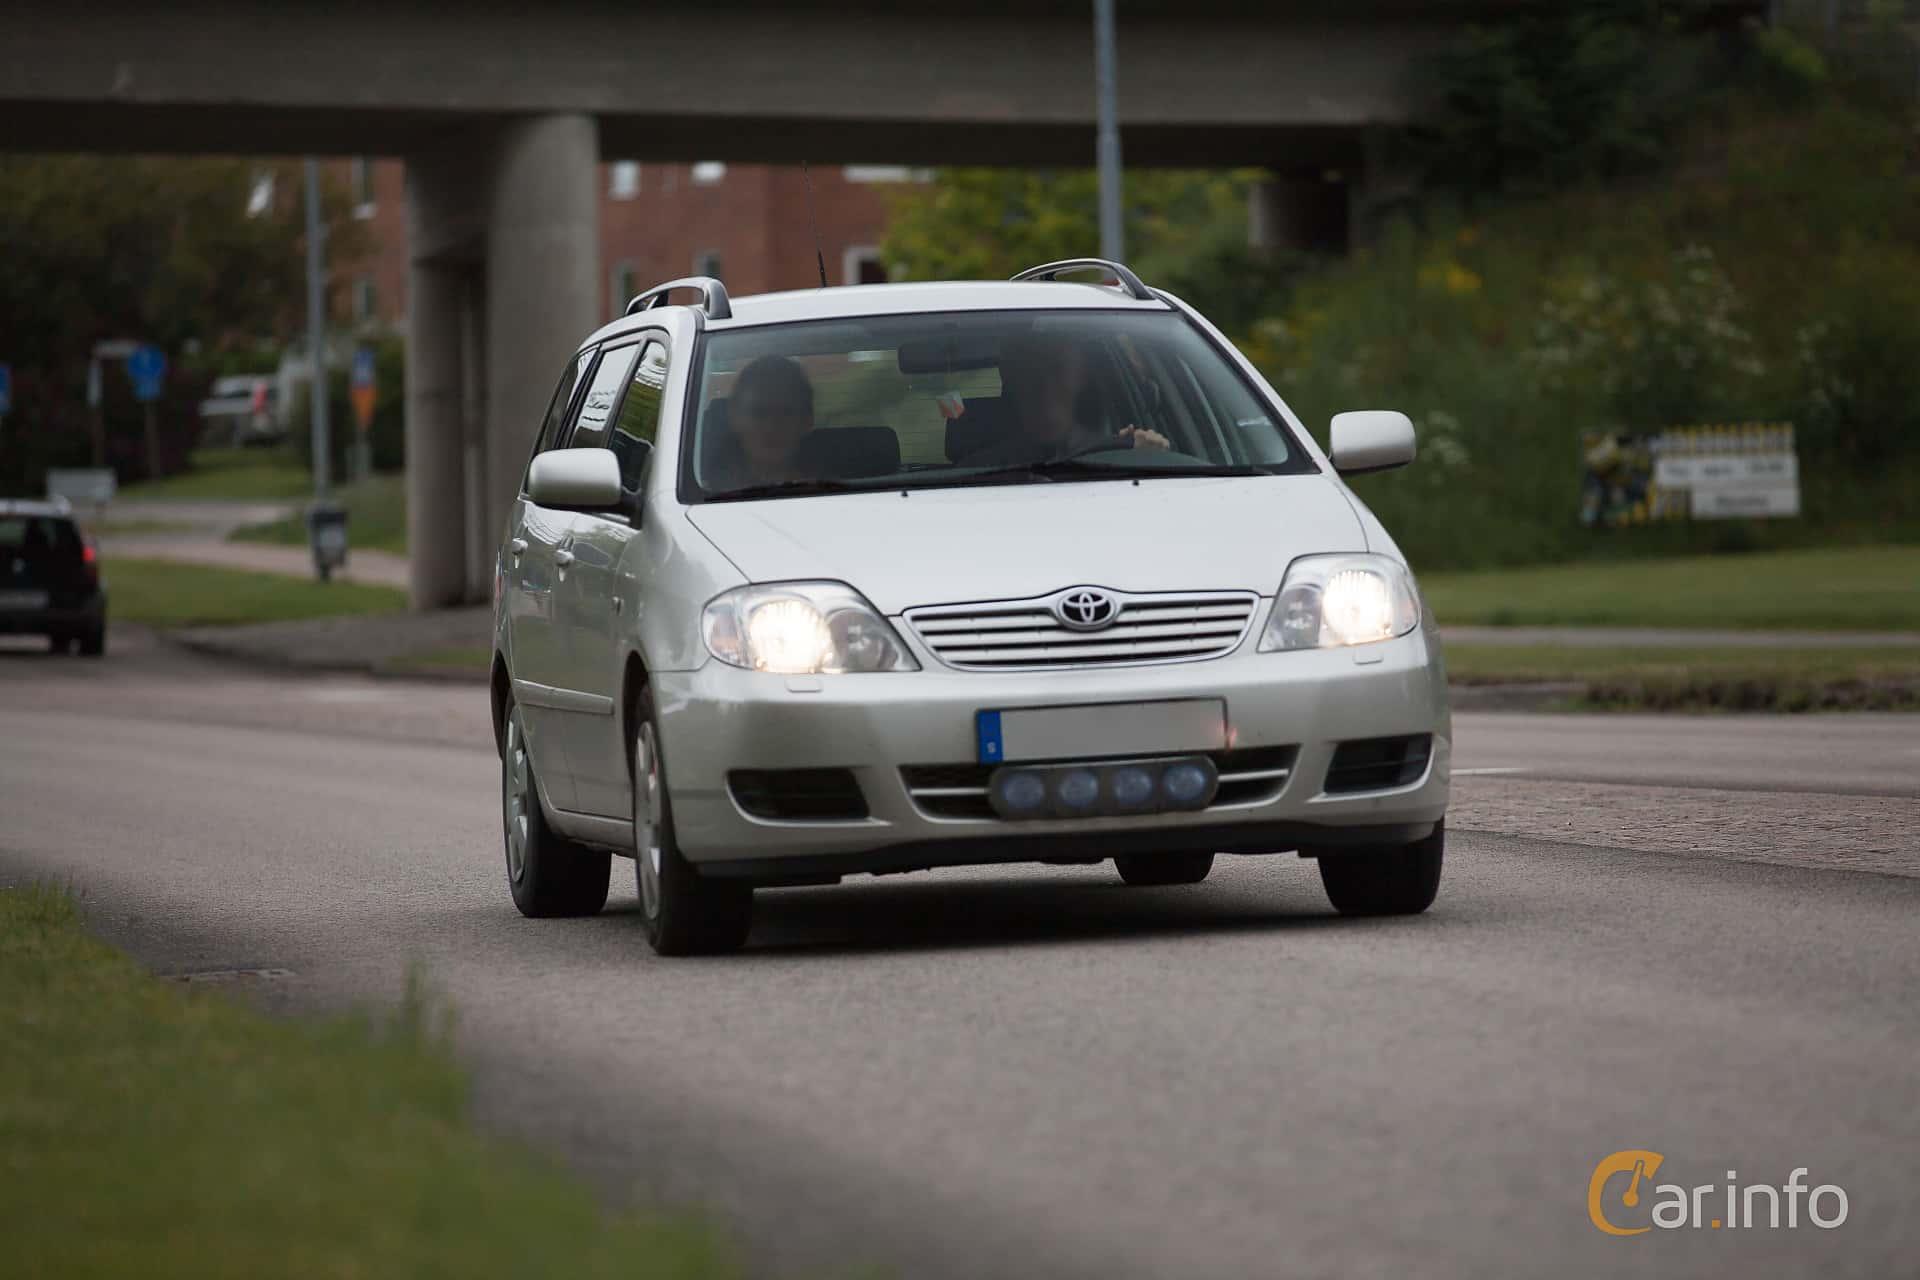 2005 Toyota Corolla For Sale >> Toyota Corolla Station Wagon E120 Facelift